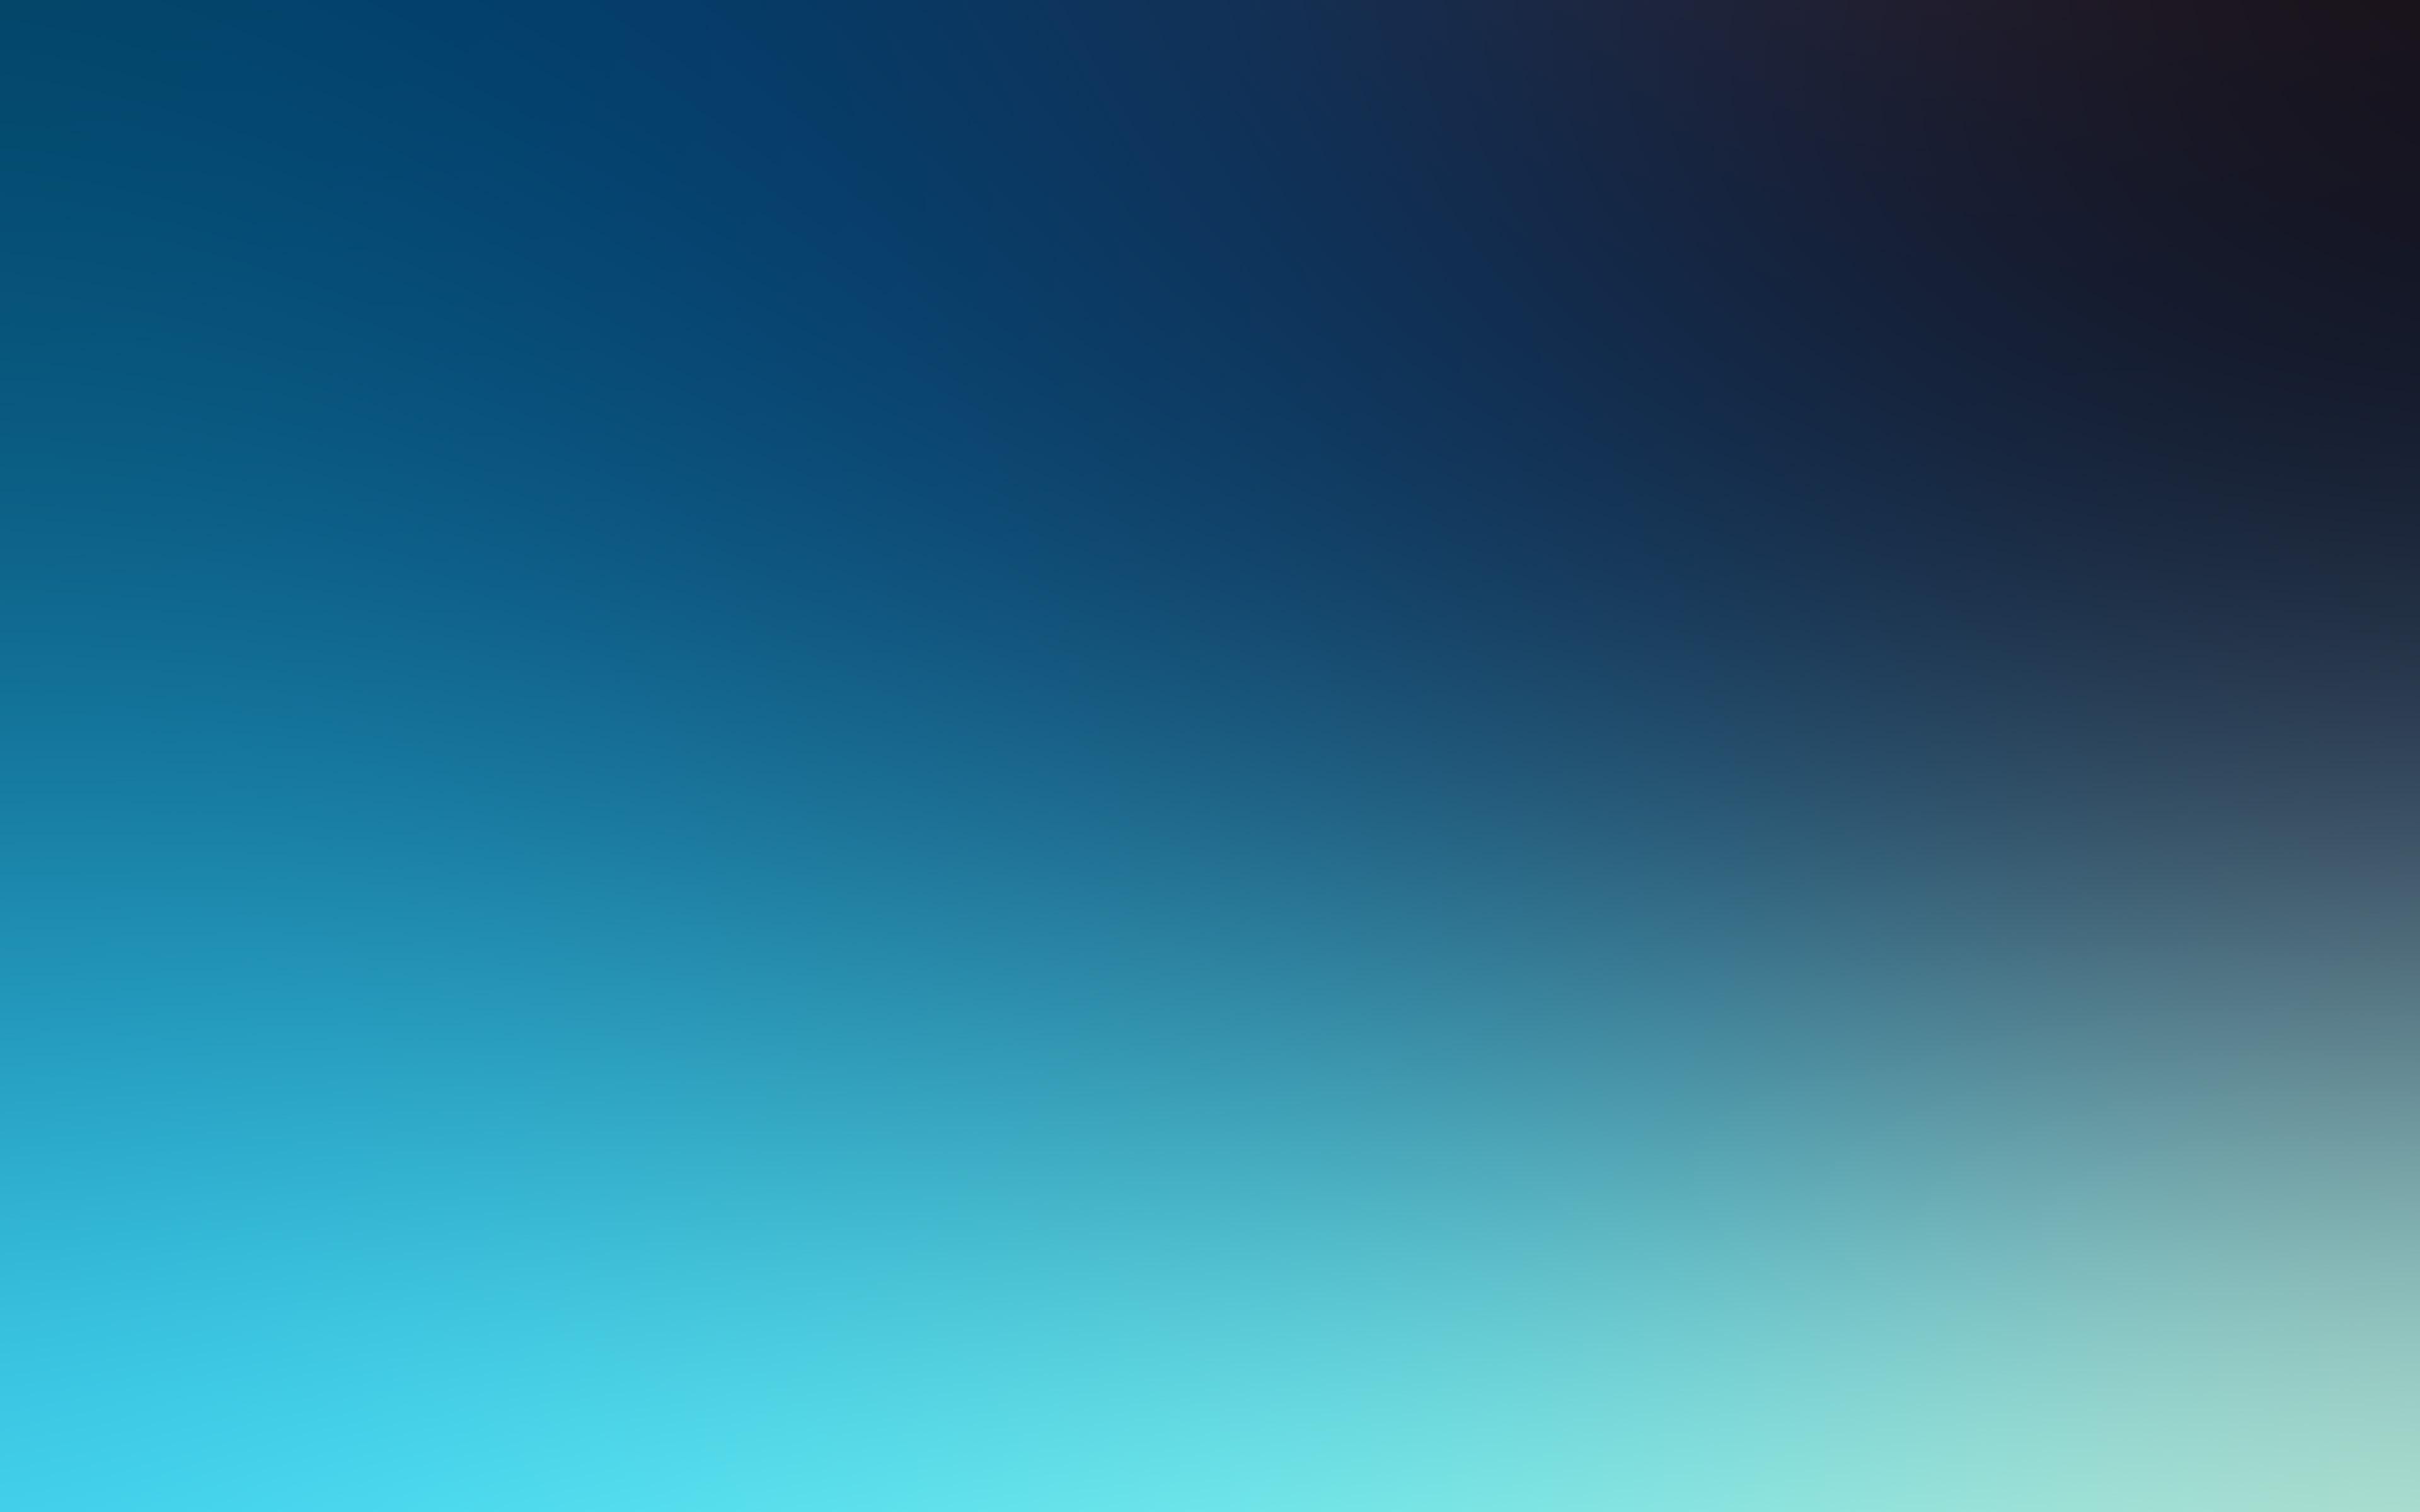 Fall Wallpaper Hd Iphone 5 Sl73 Blue Blur Gradation Wallpaper